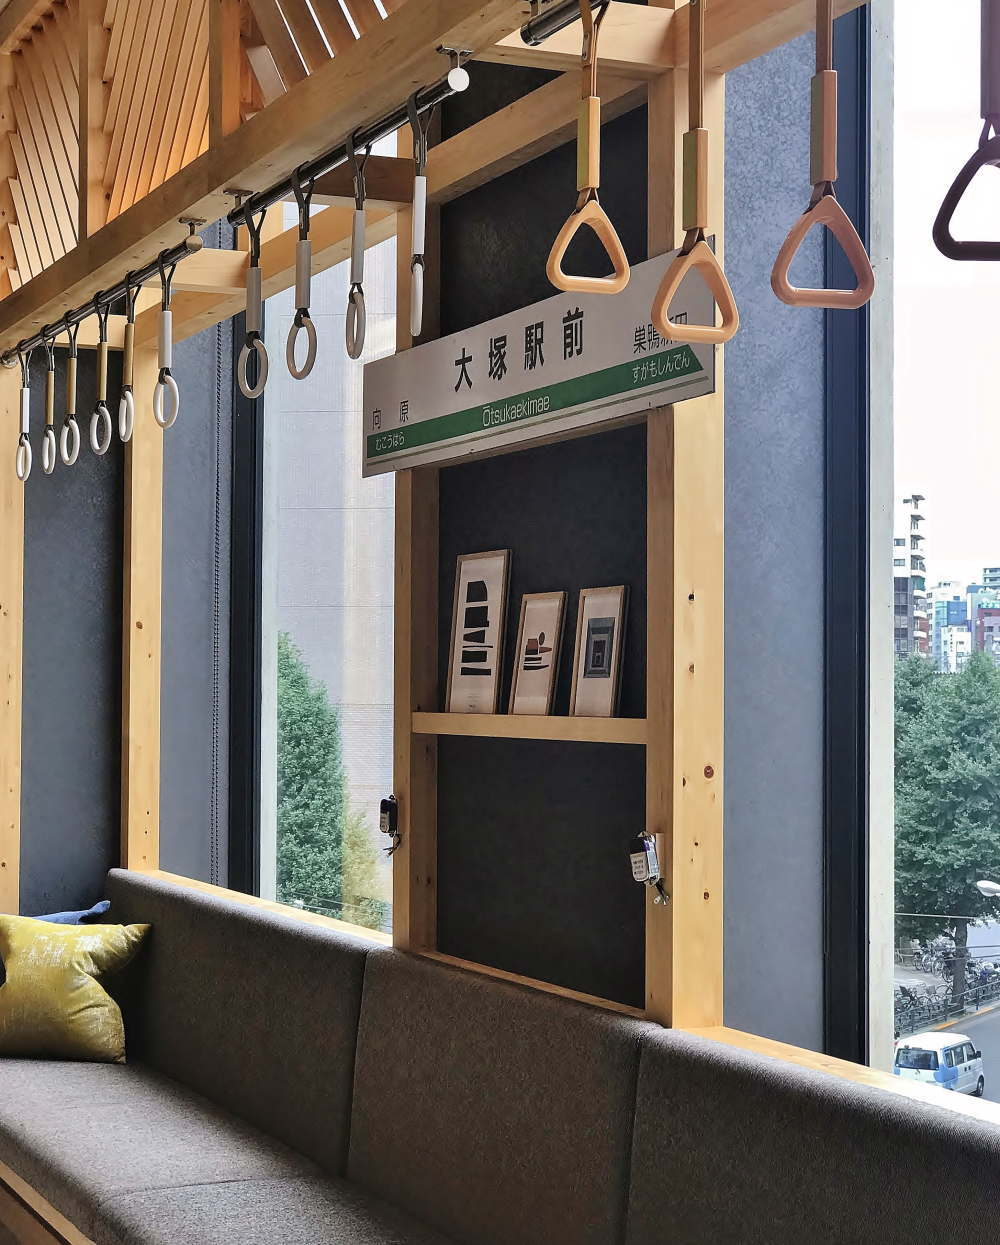 OMO5東京大塚 都電荒川線「大塚駅前」を模したロビーフロント